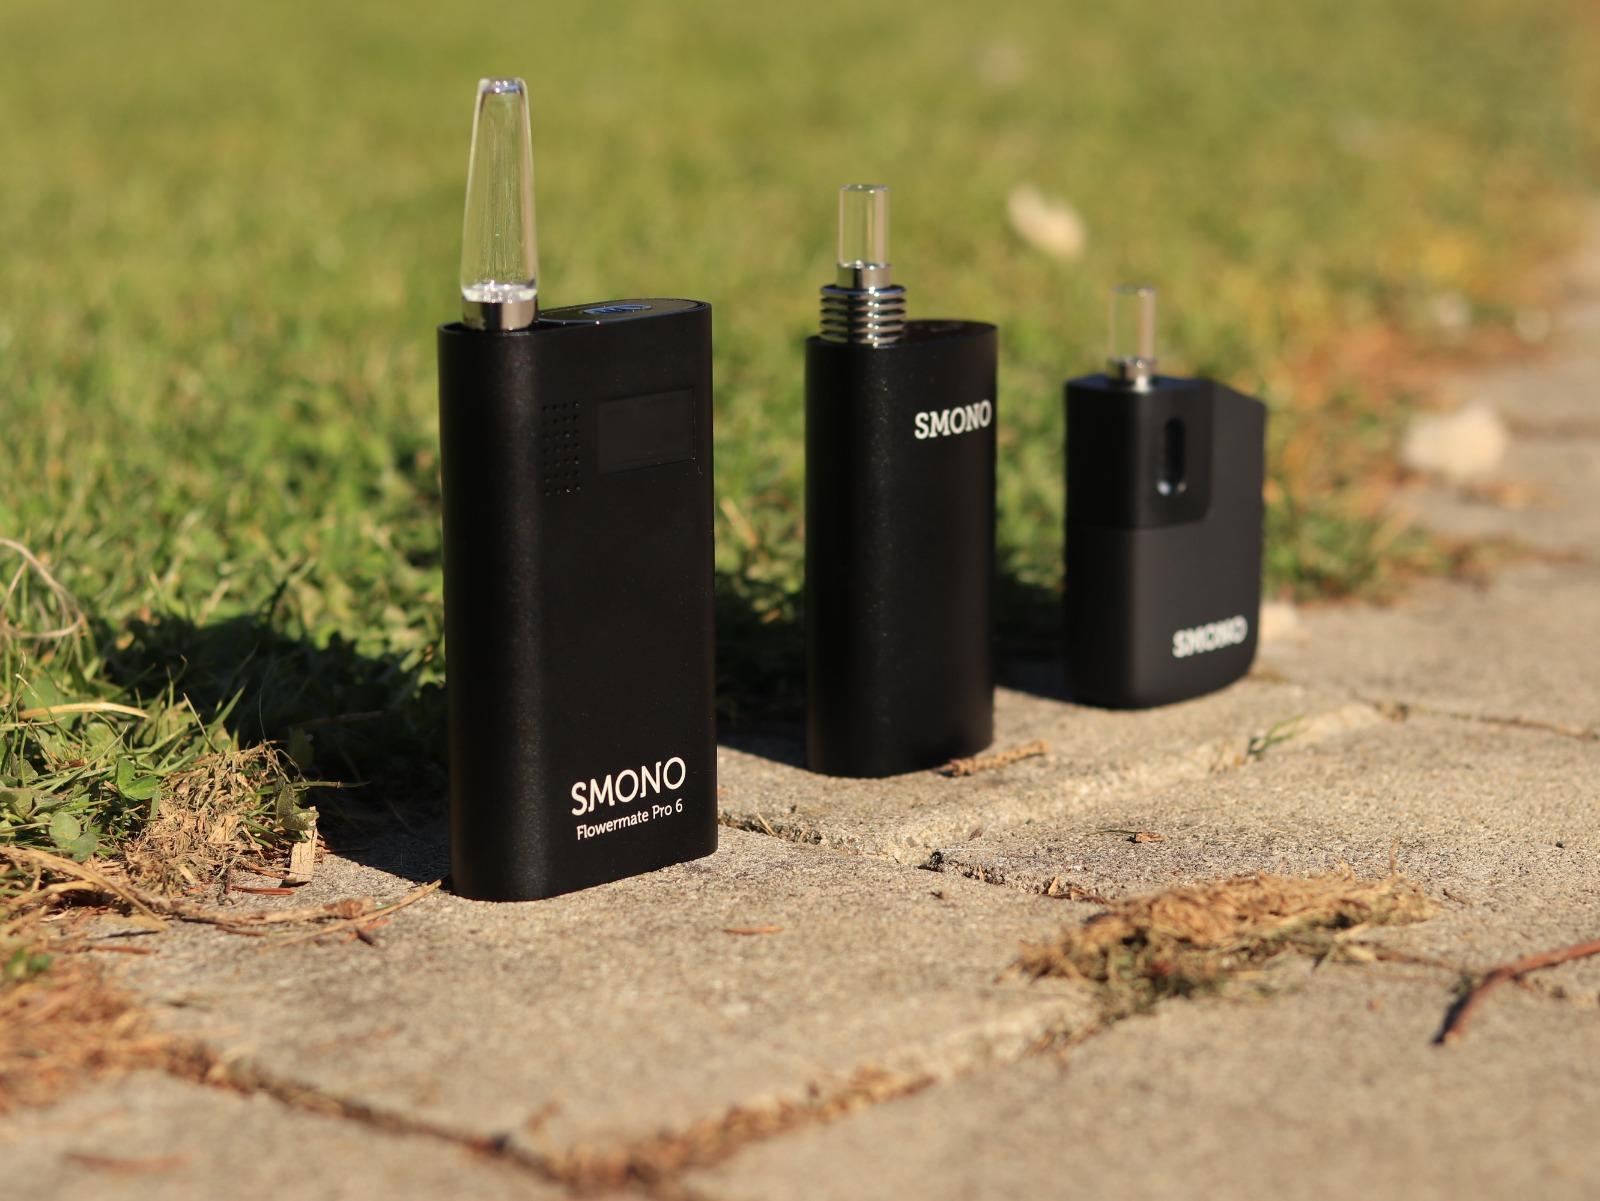 Smono Flowermate Pro 6 Vaporizer Test Bild 1